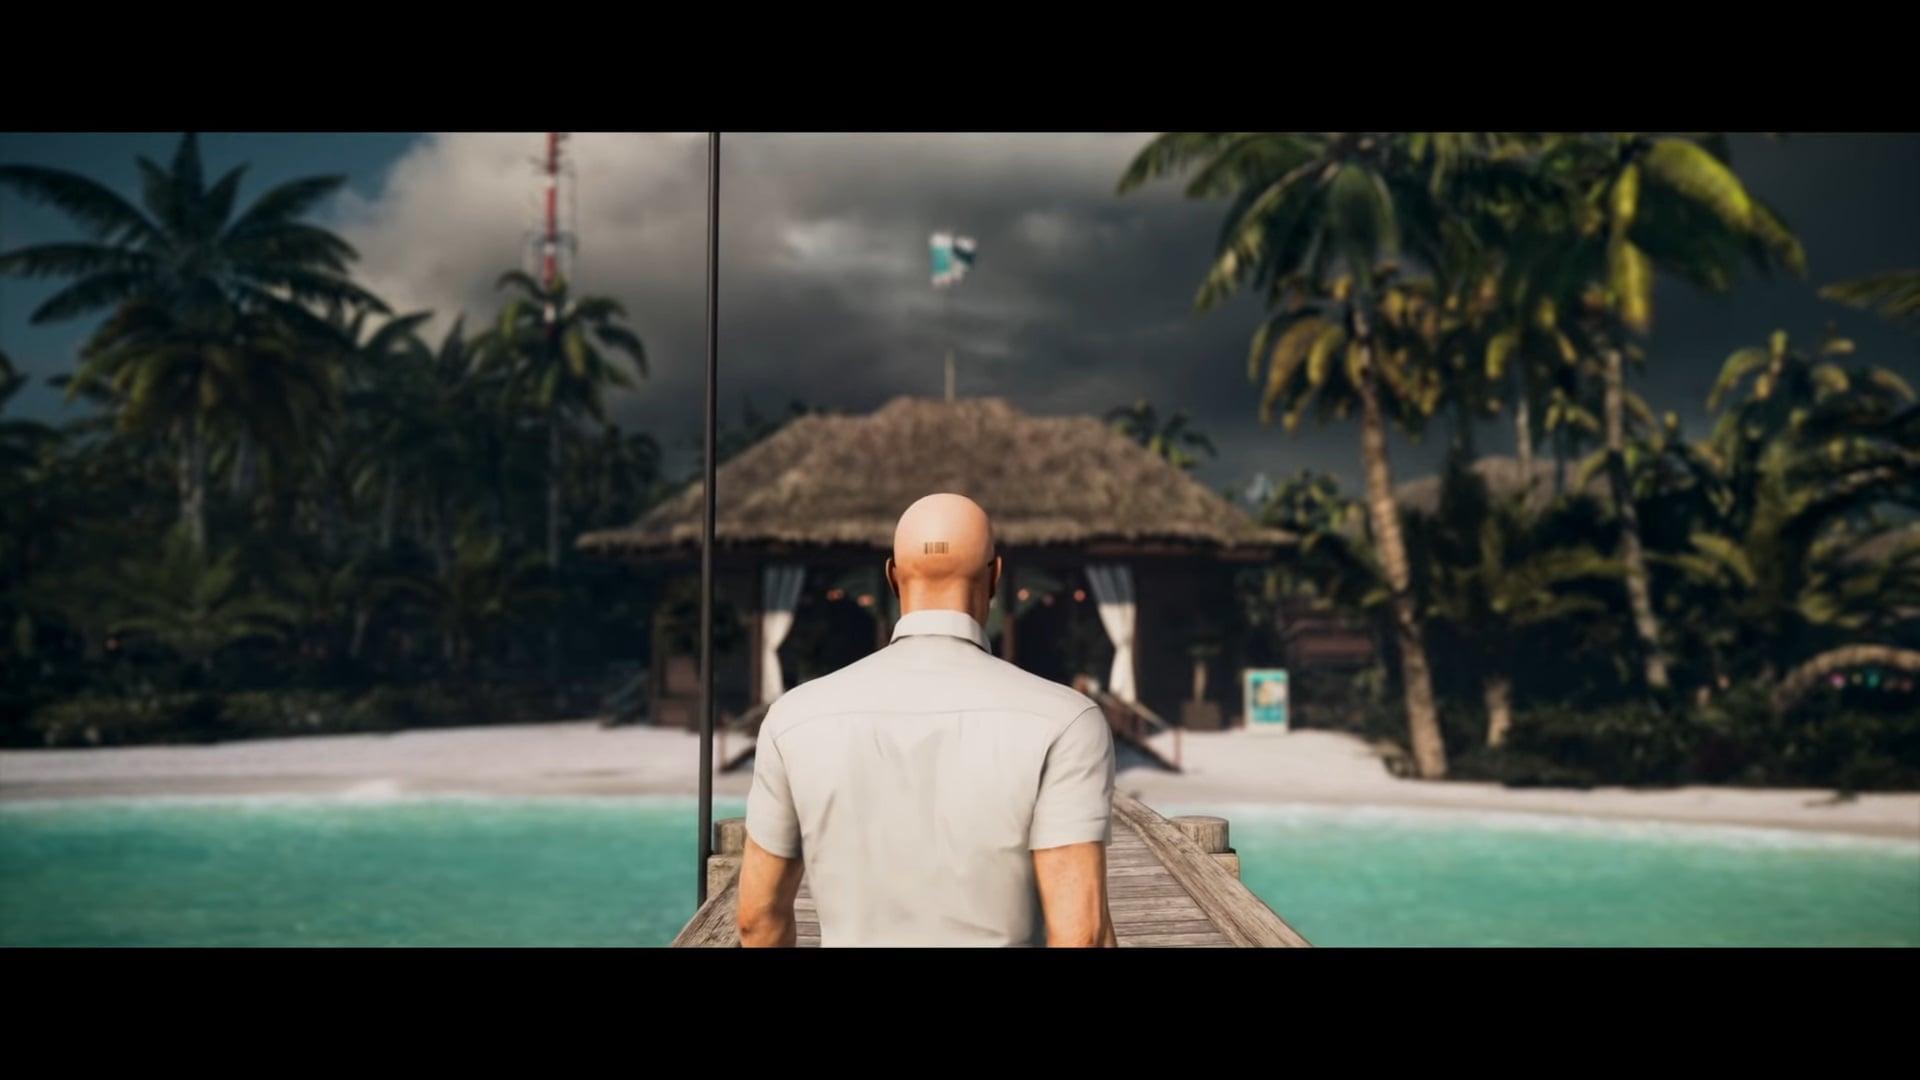 Hitman 3 Is Well Underway According To Io Interactive